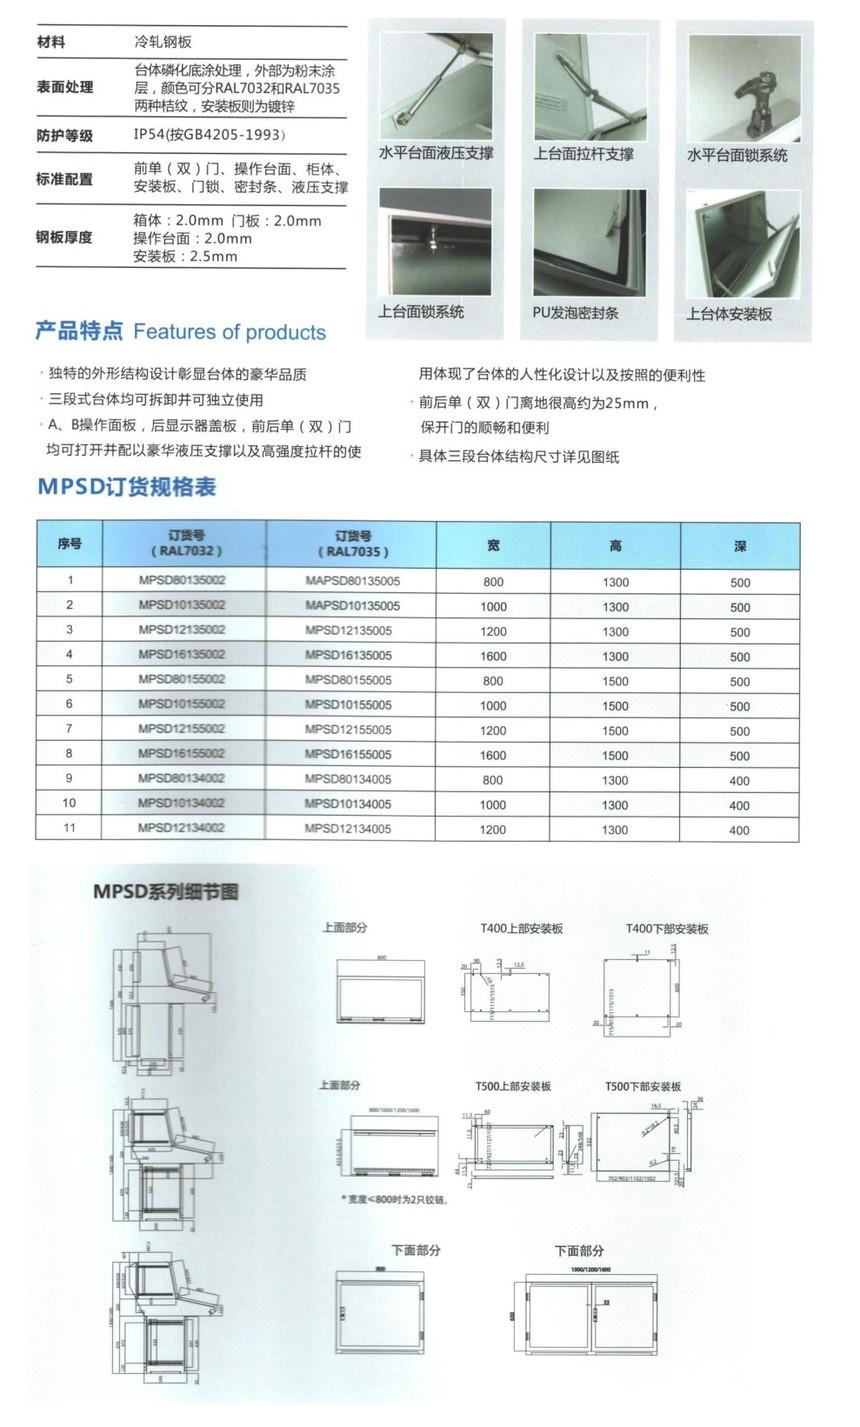 MPSD三段式操纵台01.jpg